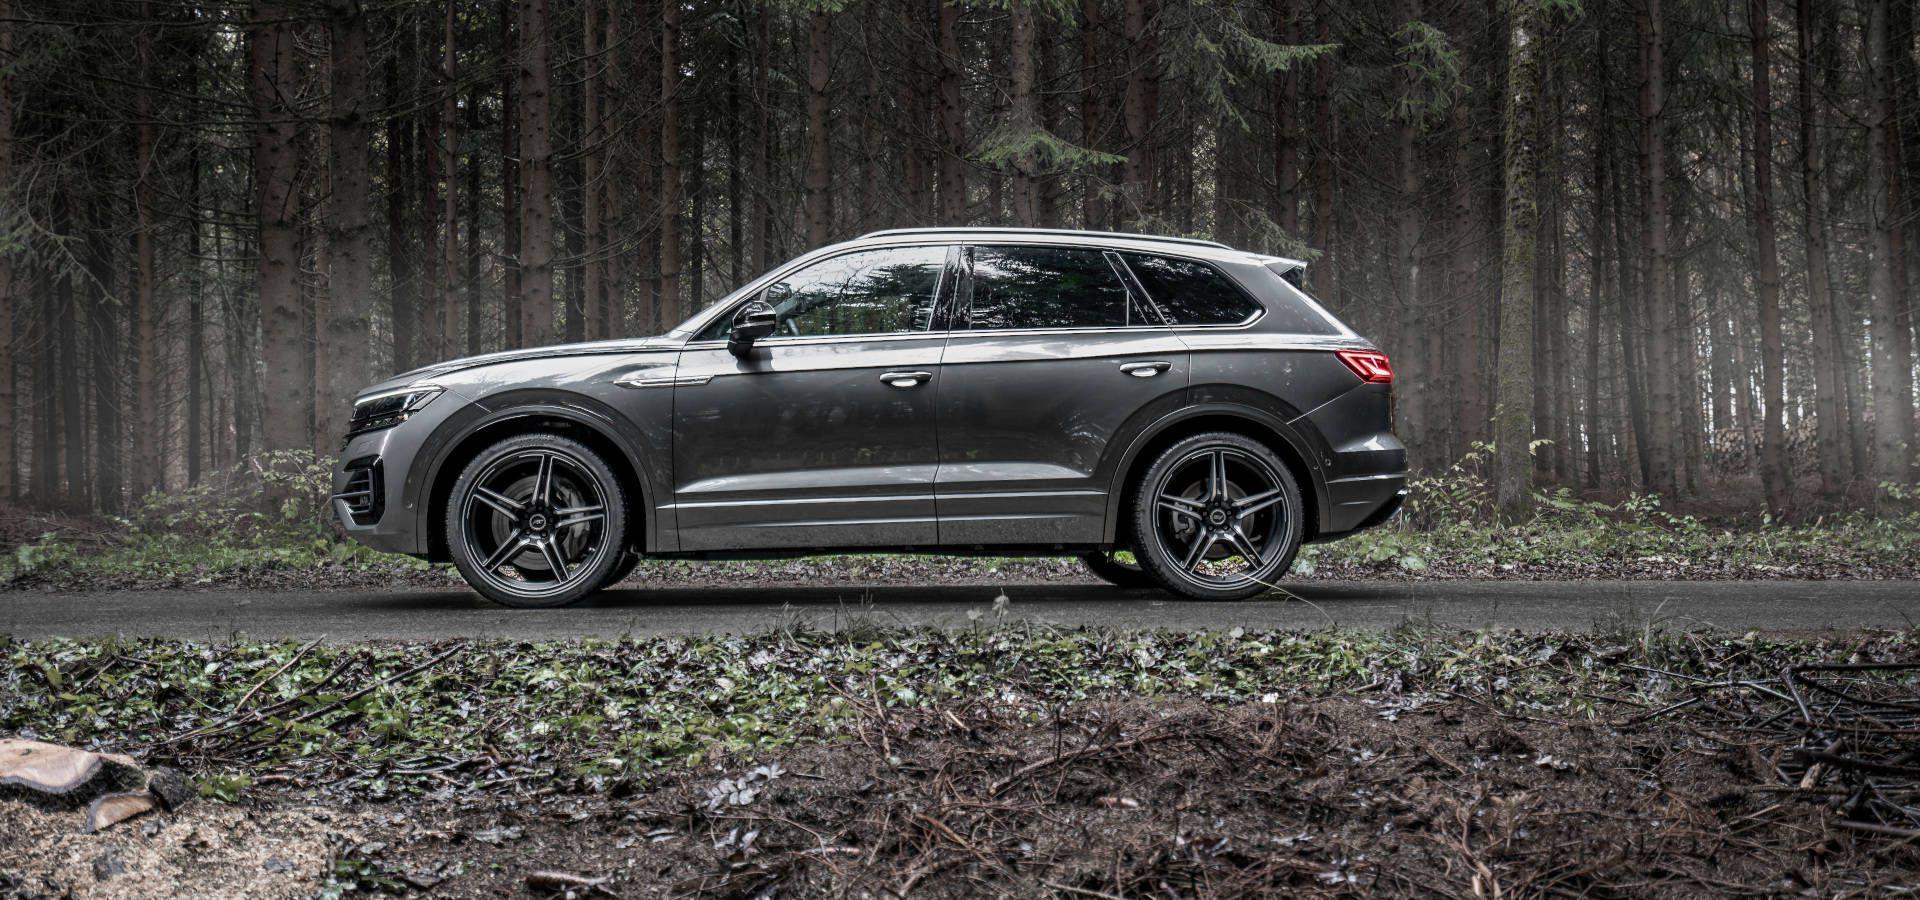 VW Touareg grey FR  Seite bdccfd